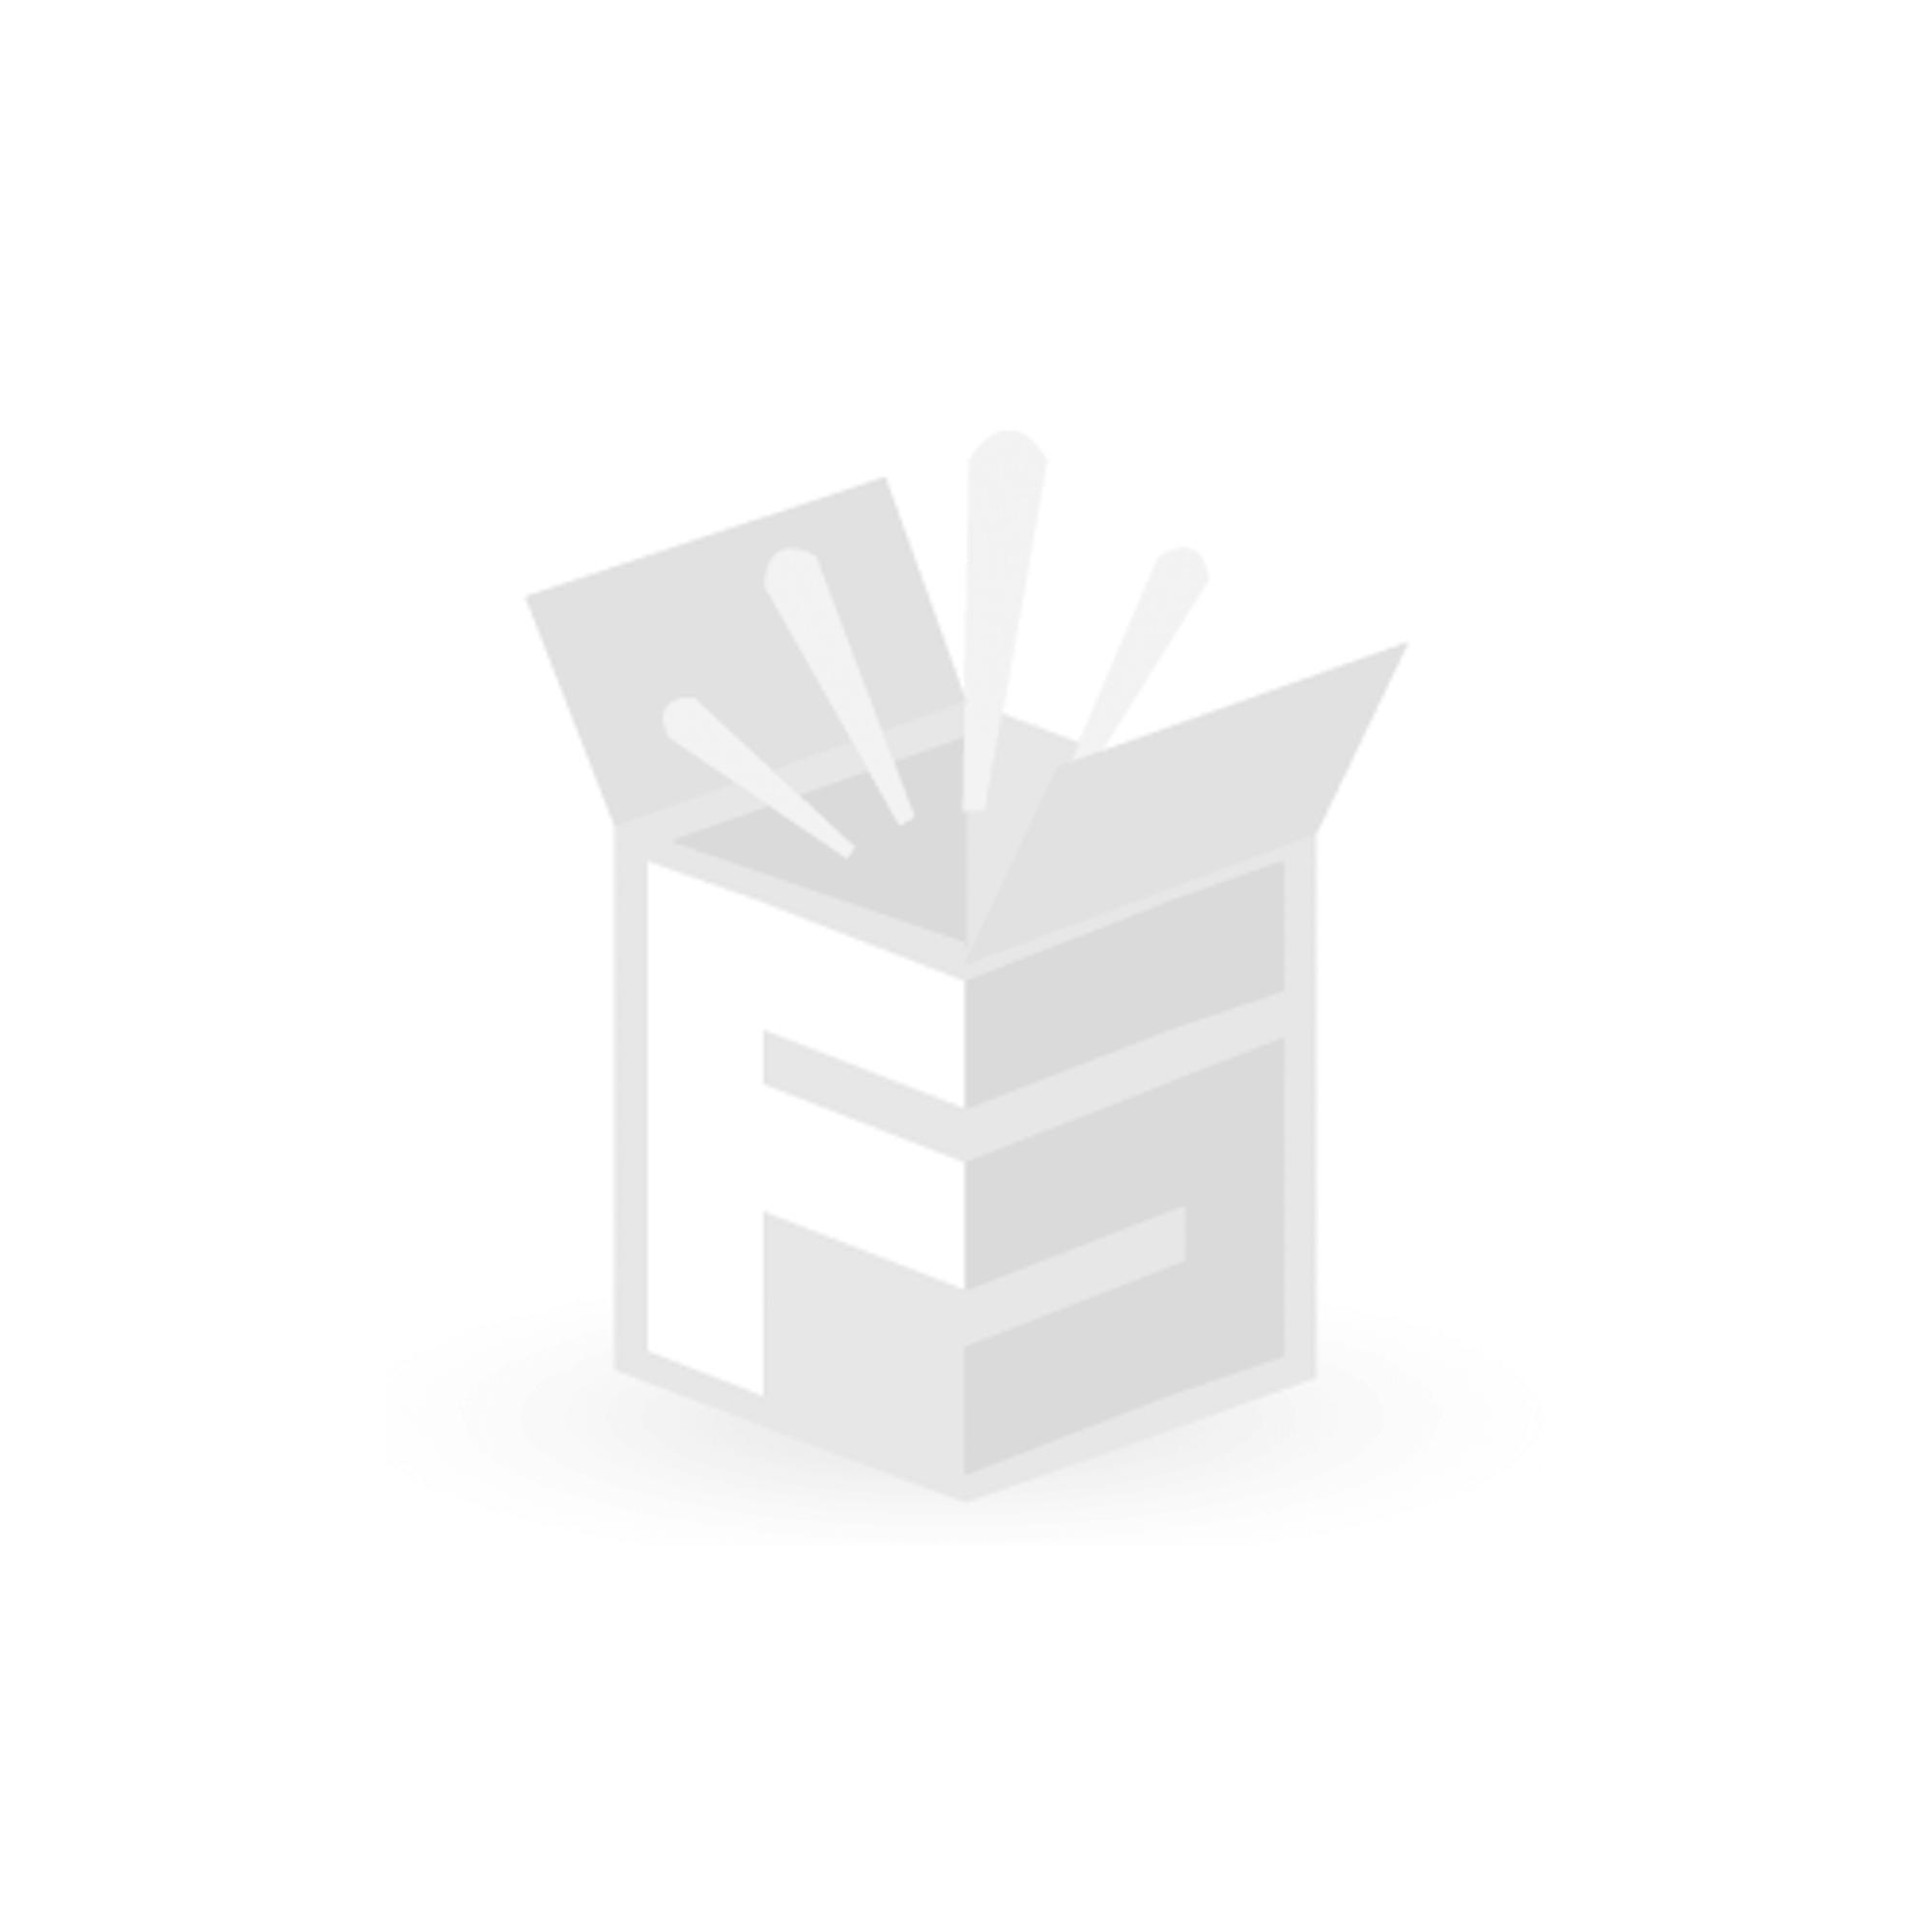 bosch akku bohrschrauber gsr 18 2 li plus 2x 4 0 ah inkl. Black Bedroom Furniture Sets. Home Design Ideas